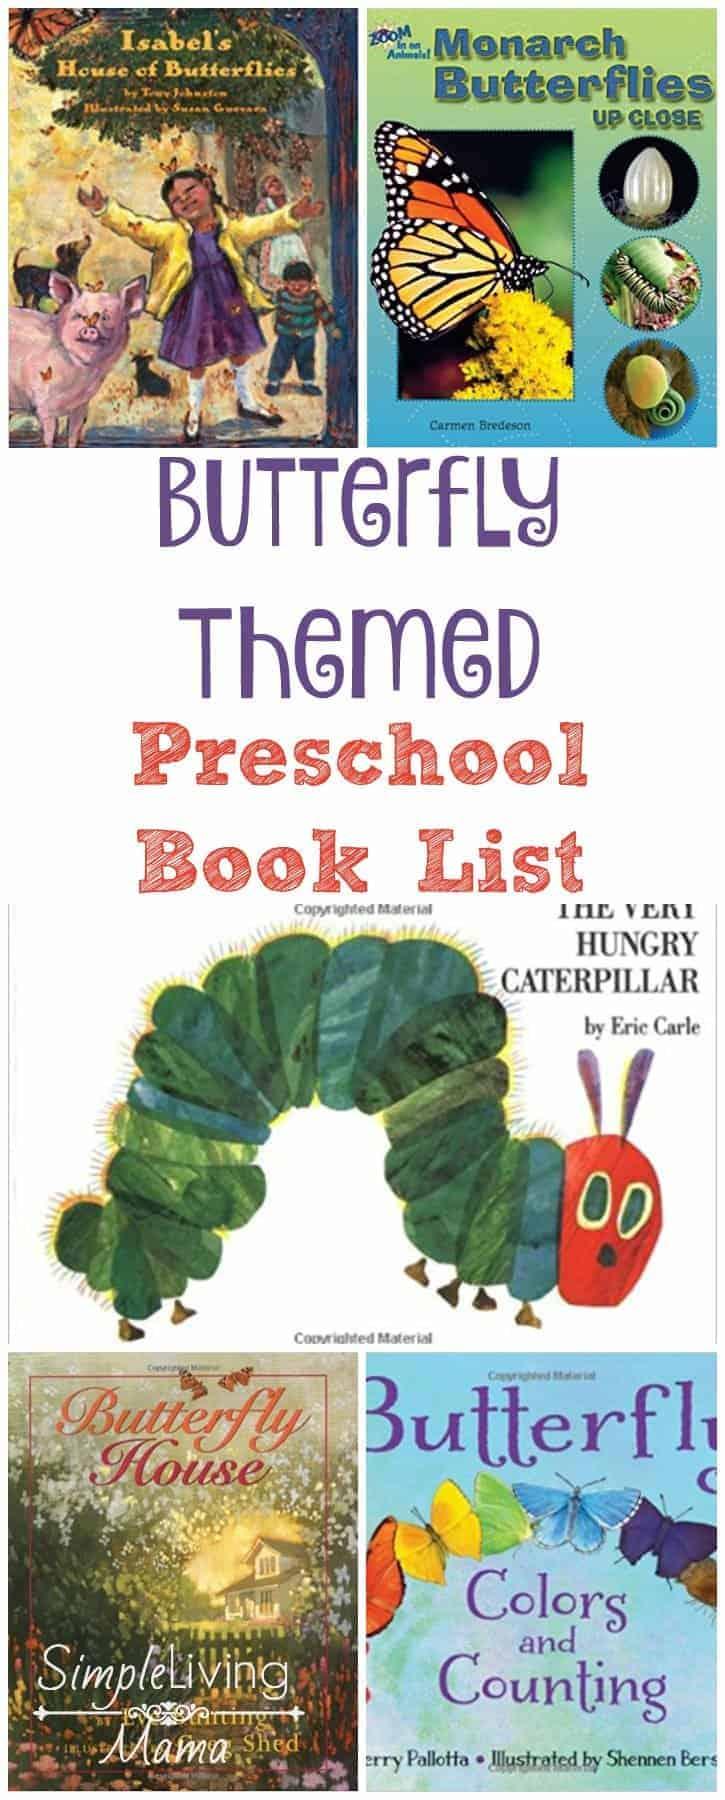 Butterfly themed preschool book list